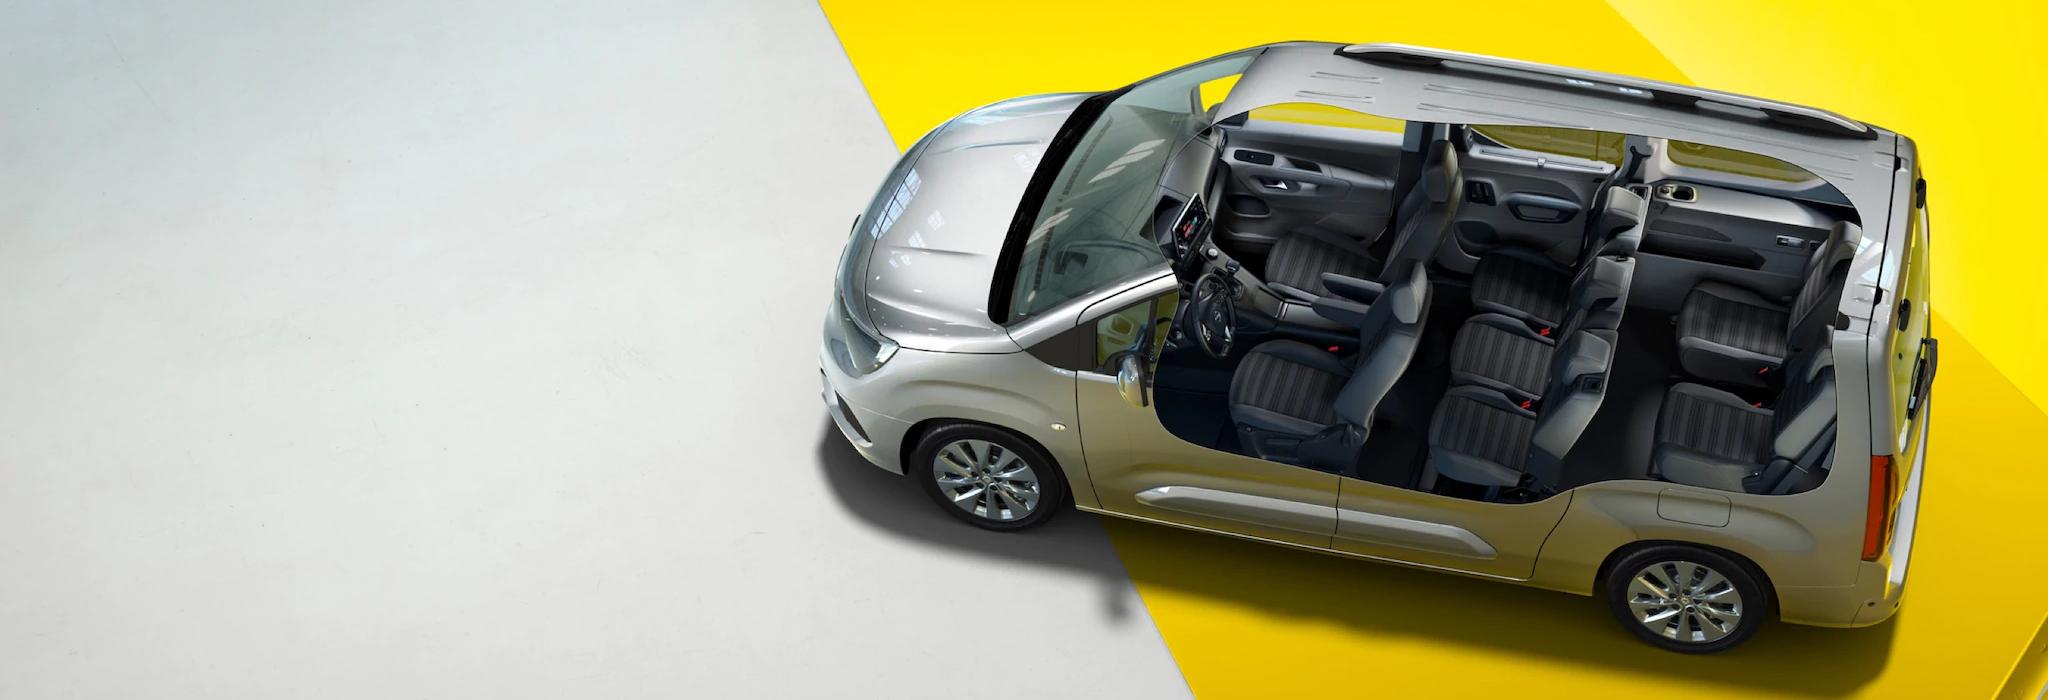 Opel_combo_life_7_seater_21x9_cml18_e01_003